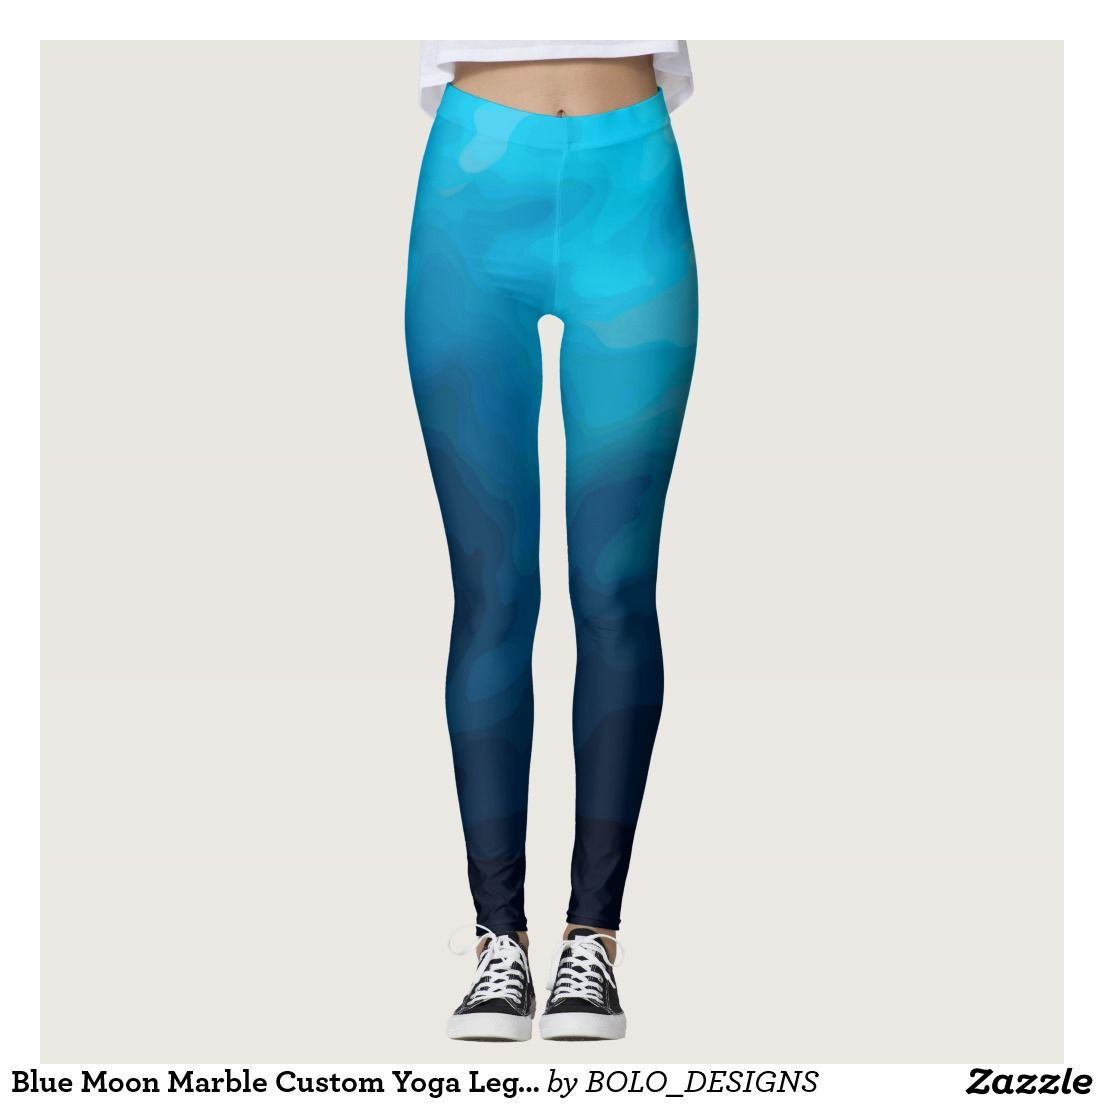 Blue Moon Marble Custom Yoga Leggings by BOLO Designs.